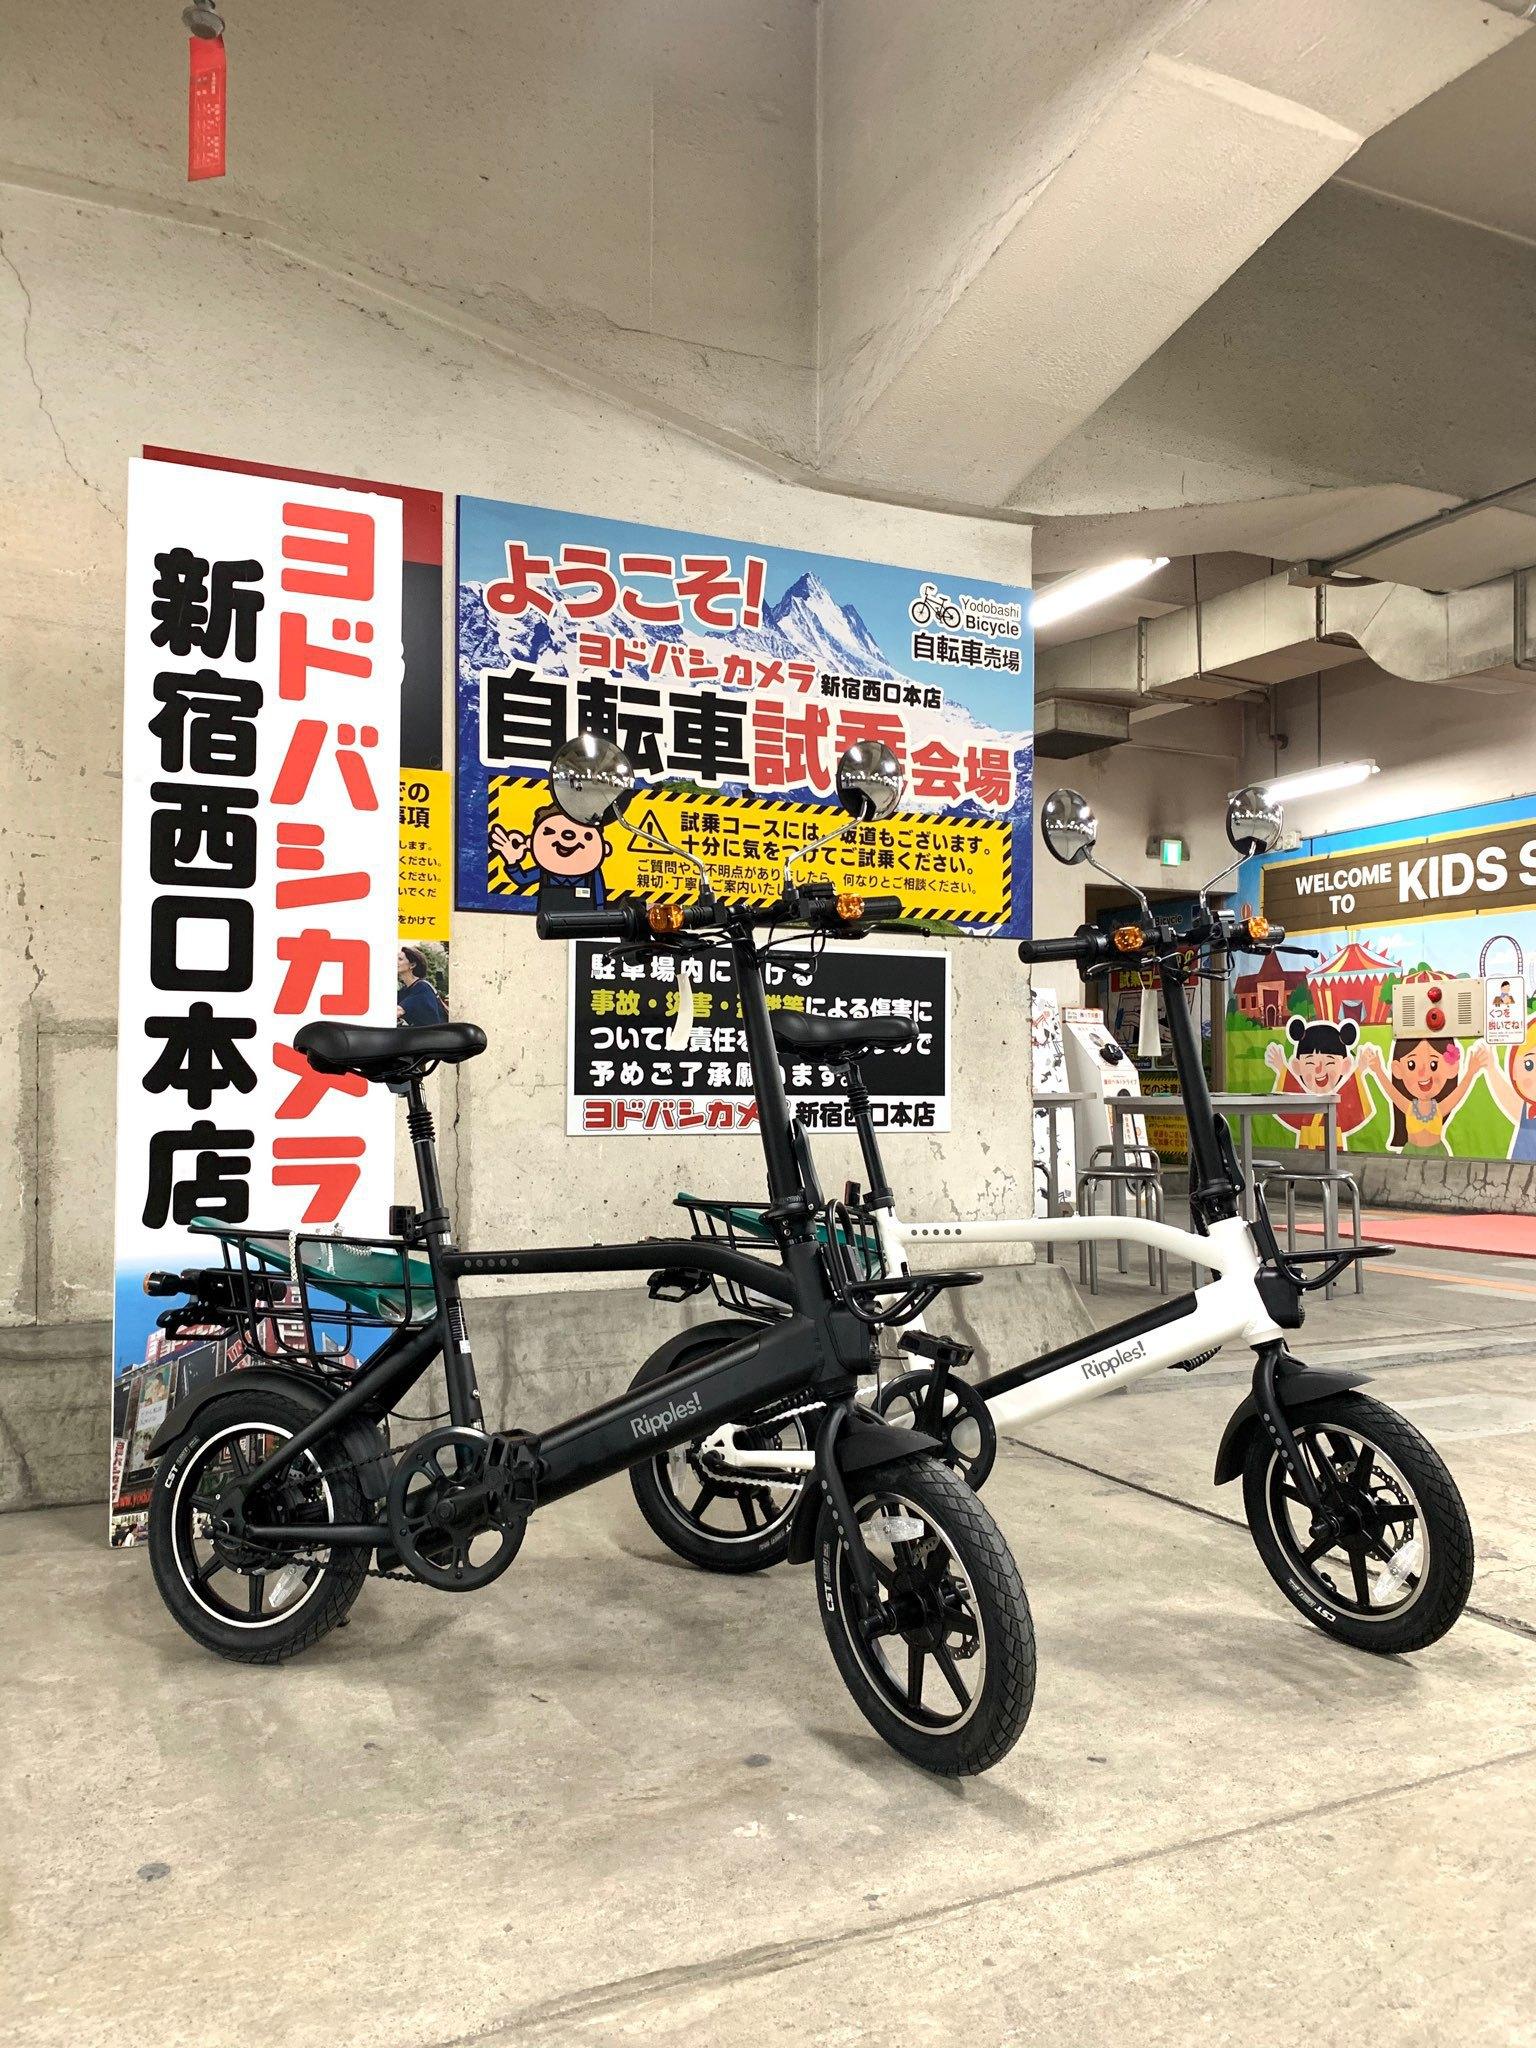 http://image.yodobashi.com/promotion/a/9191/200000017500088001/SD_200000017500088001510B1.jpg